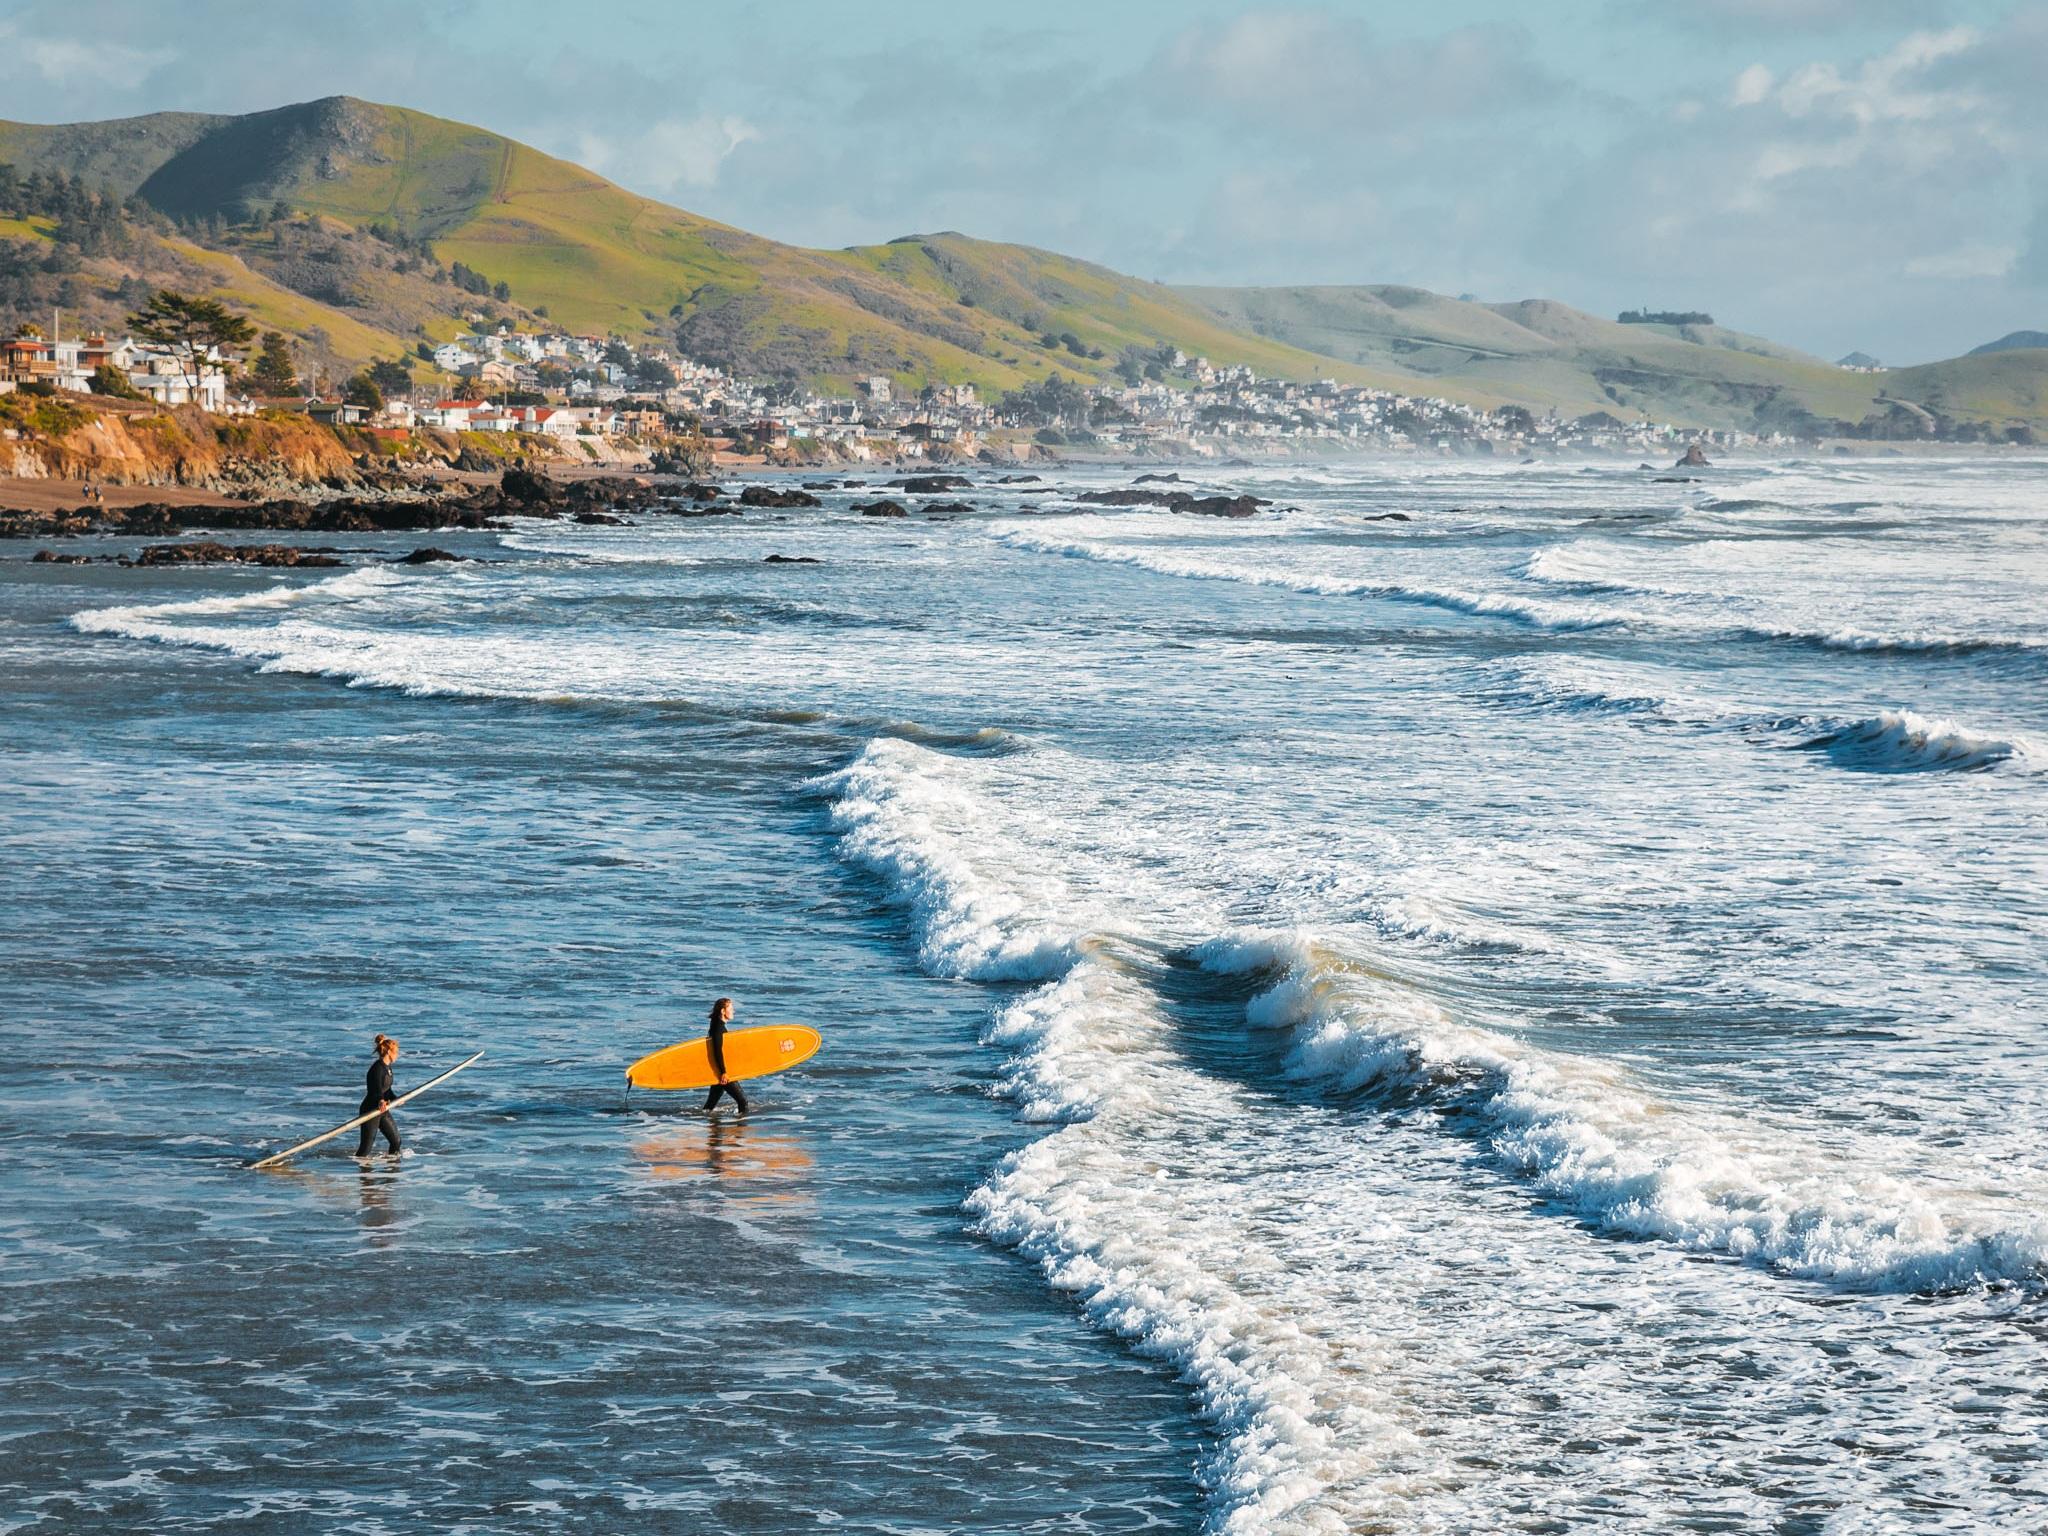 Surfer girls on Cayucos Beach // 5 Adventurous Things to Do in San Luis Obispo County #readysetjetset #surfing #slocal #travel #blogpost #adventuretravel #california #westcoast